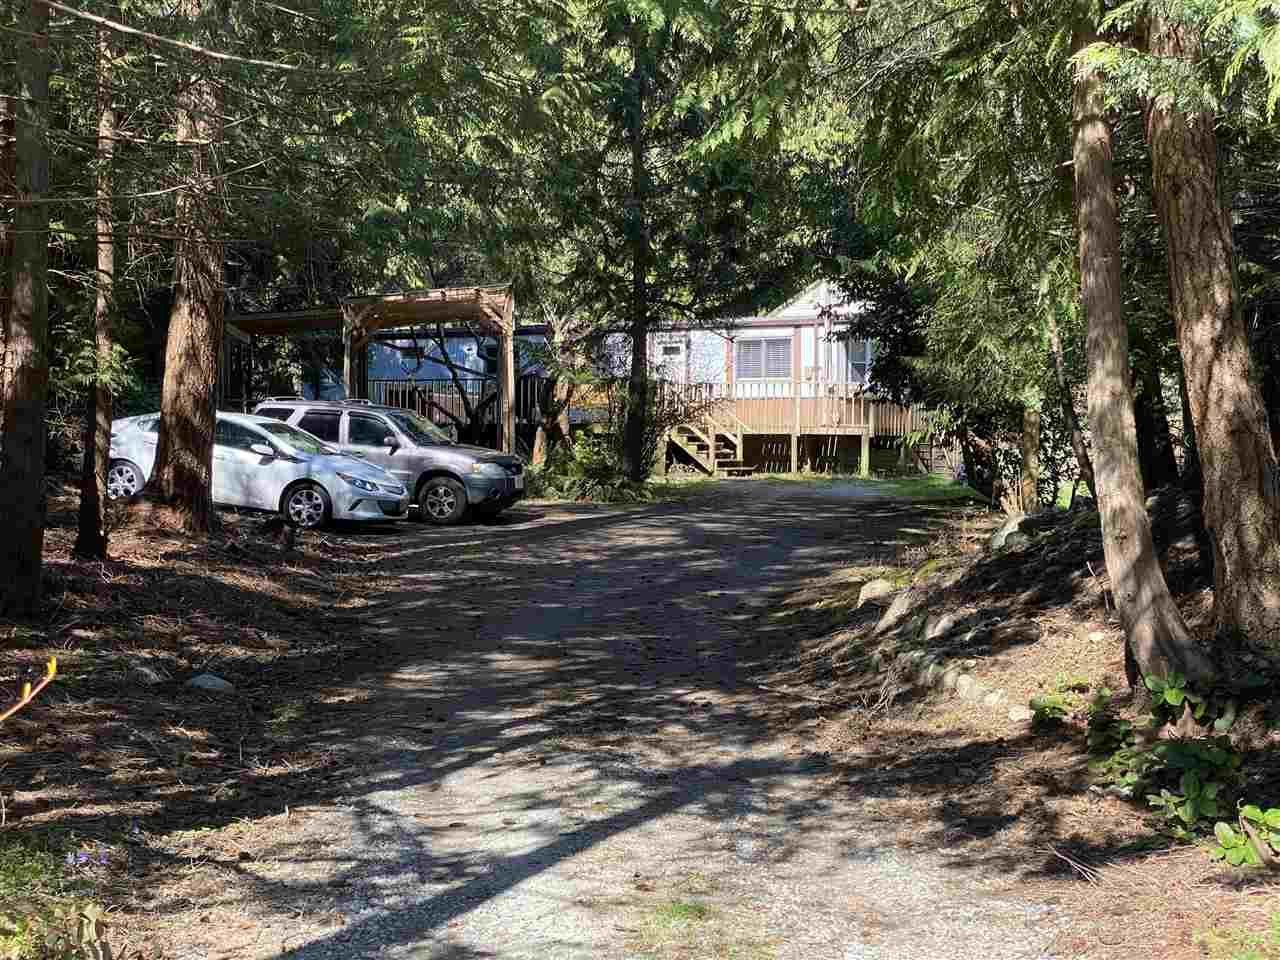 Main Photo: 8143 CEDARWOOD Road in Halfmoon Bay: Halfmn Bay Secret Cv Redroofs Manufactured Home for sale (Sunshine Coast)  : MLS®# R2560997